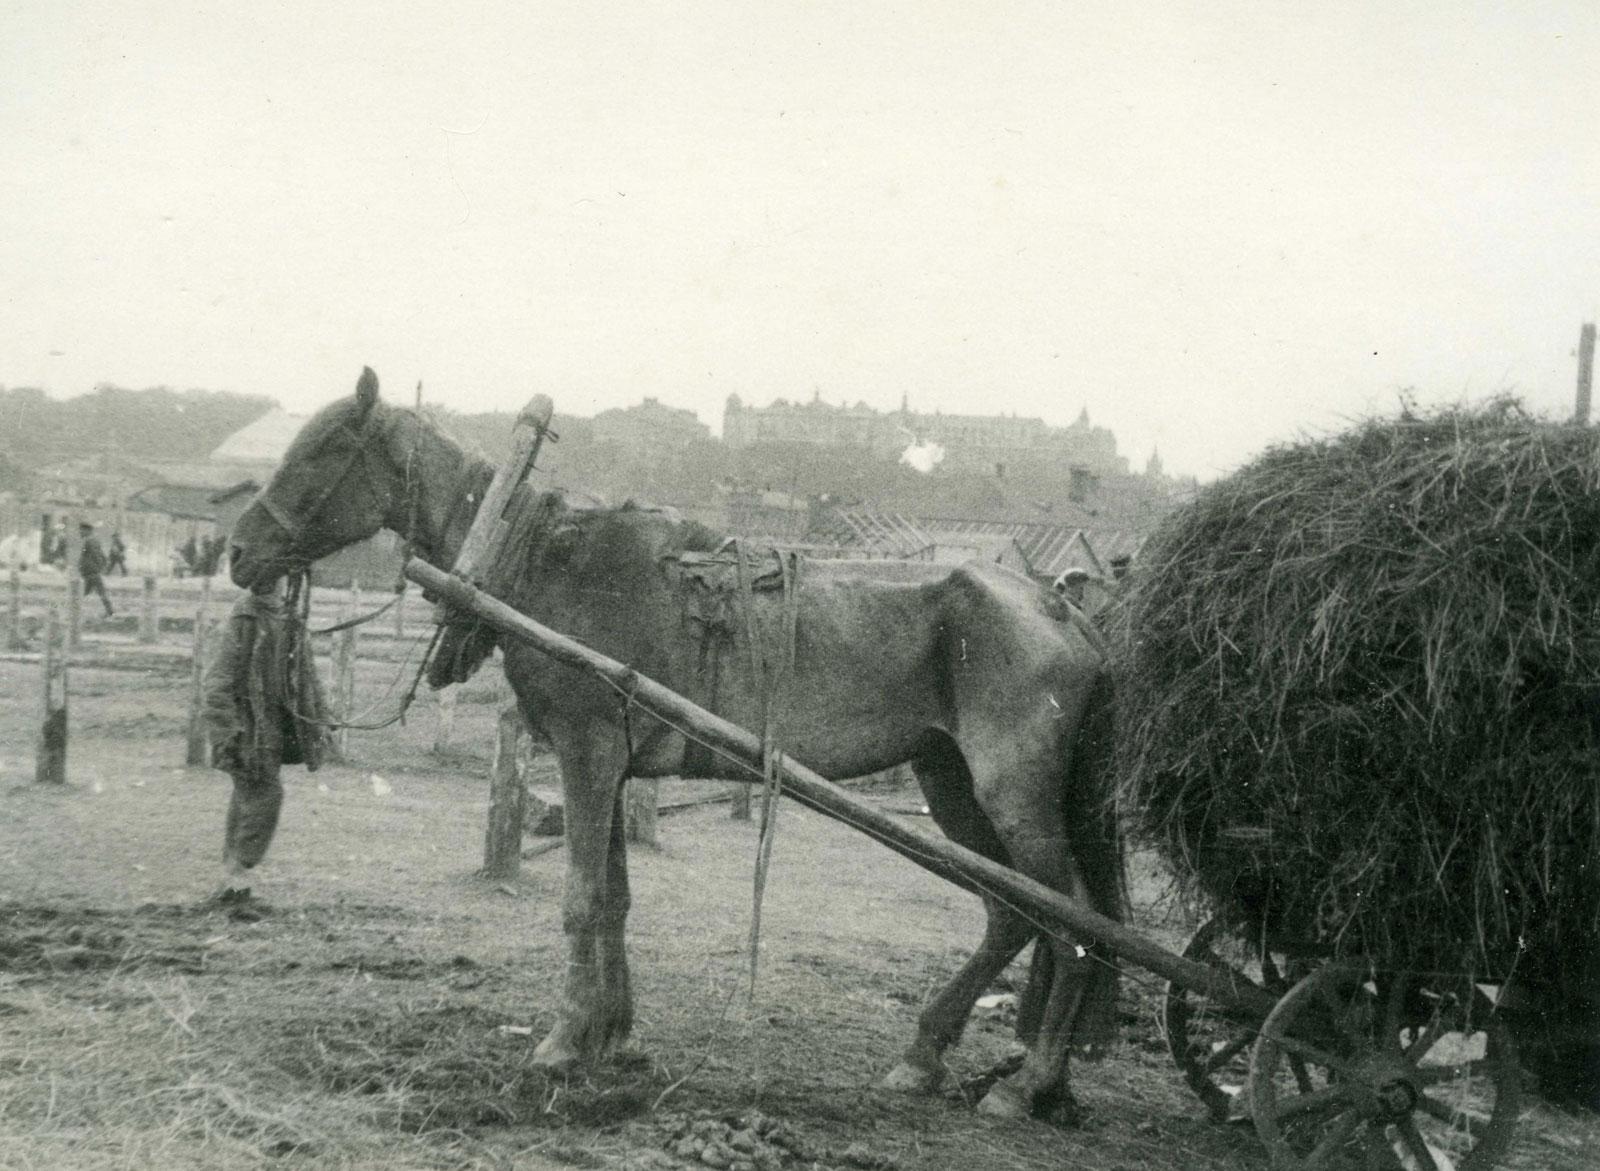 Holodomor-Great-Famine-Ukraine-emaciated-horse-1932-1933-Alexander-Wienerberger-photographer.jpg